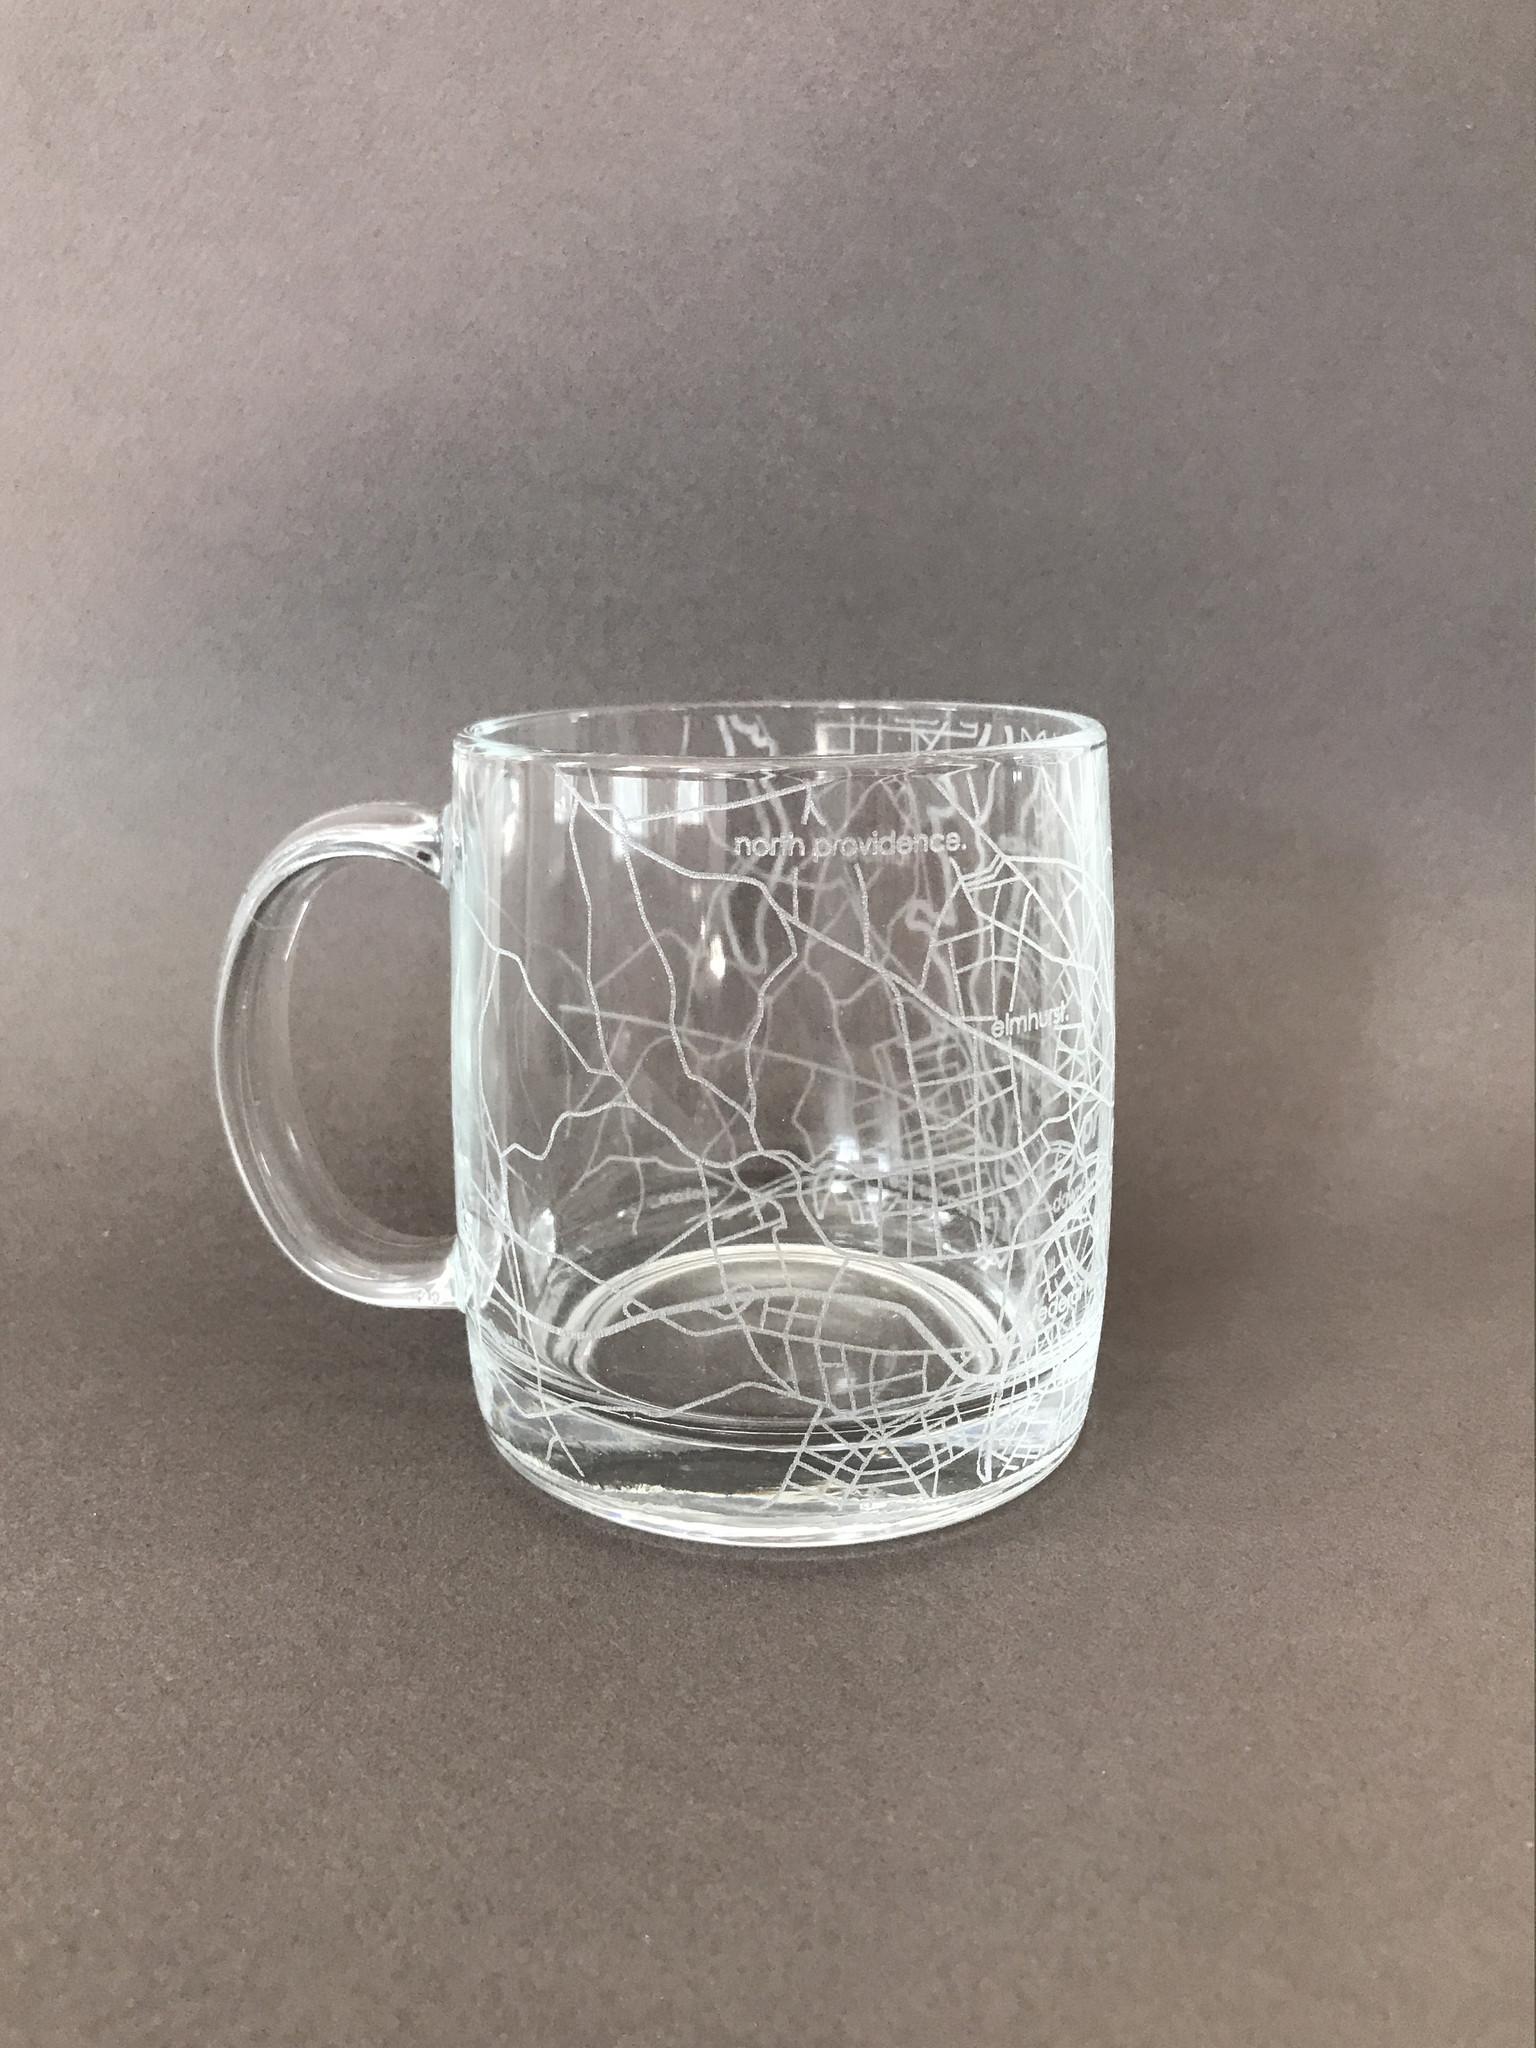 Well Told Hometown Providence Glass Handled Coffee Mug-1